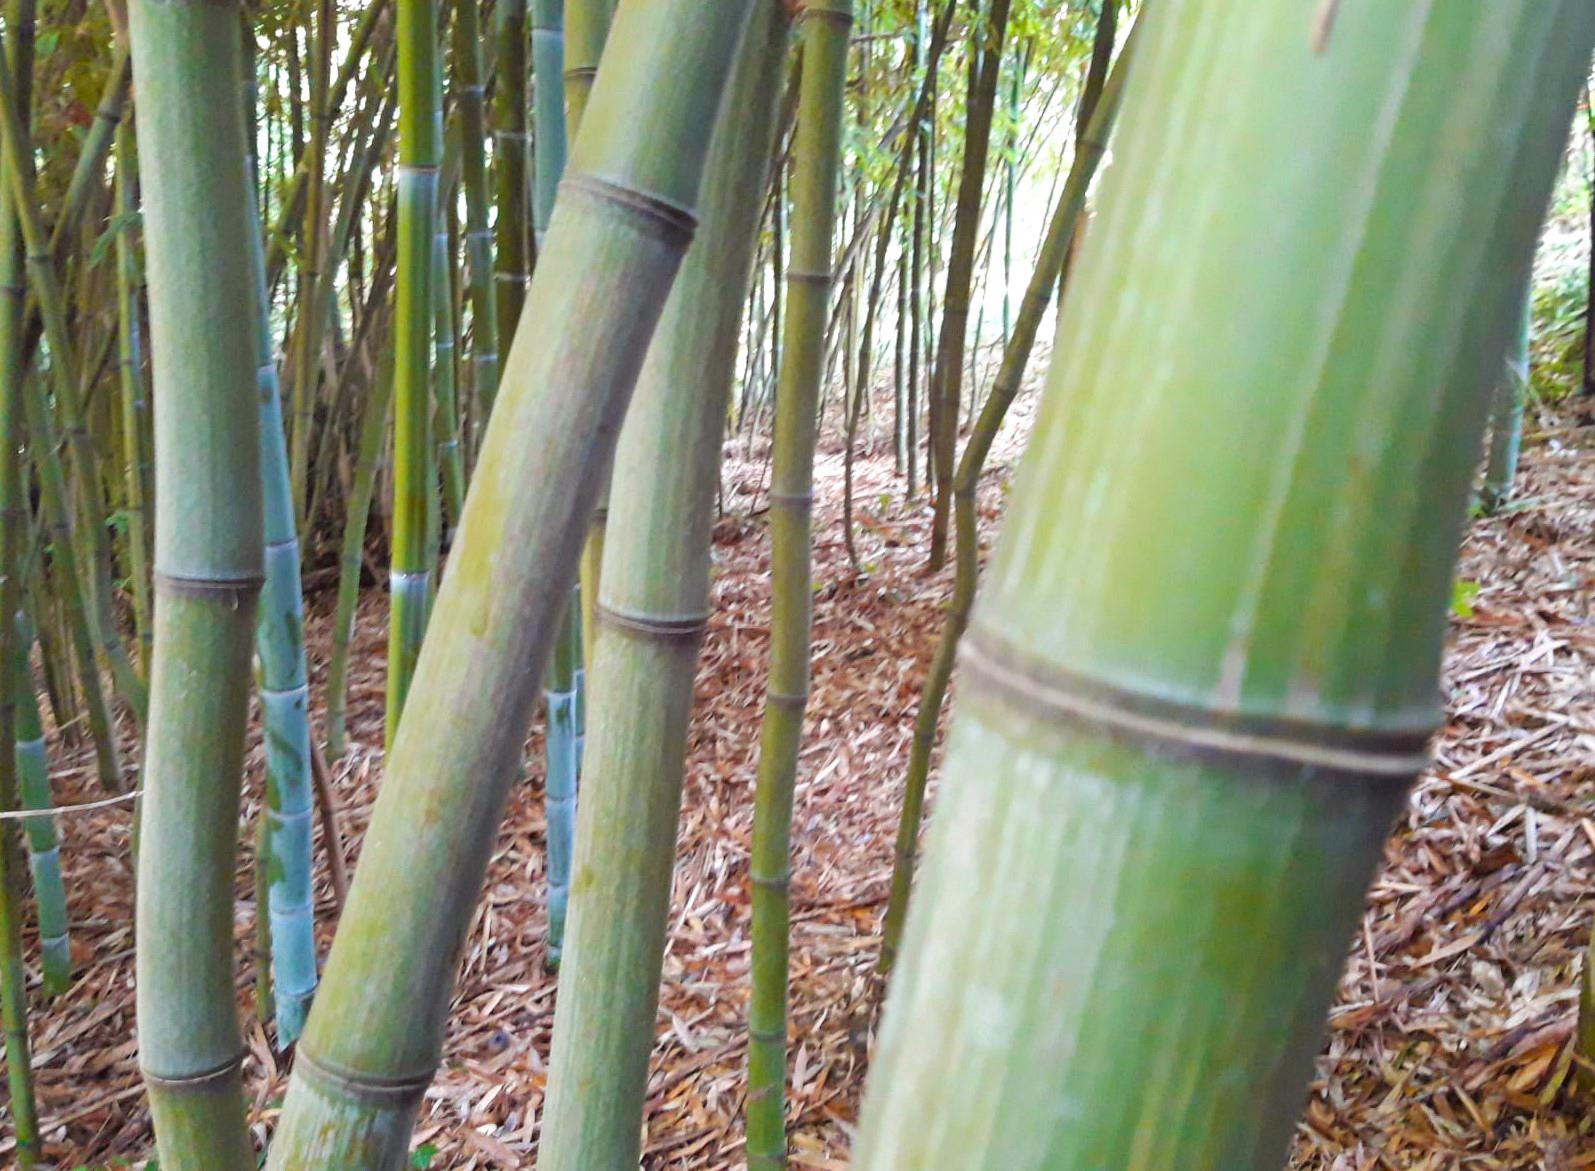 bambu-pianta-futuro-nuova-economia-3